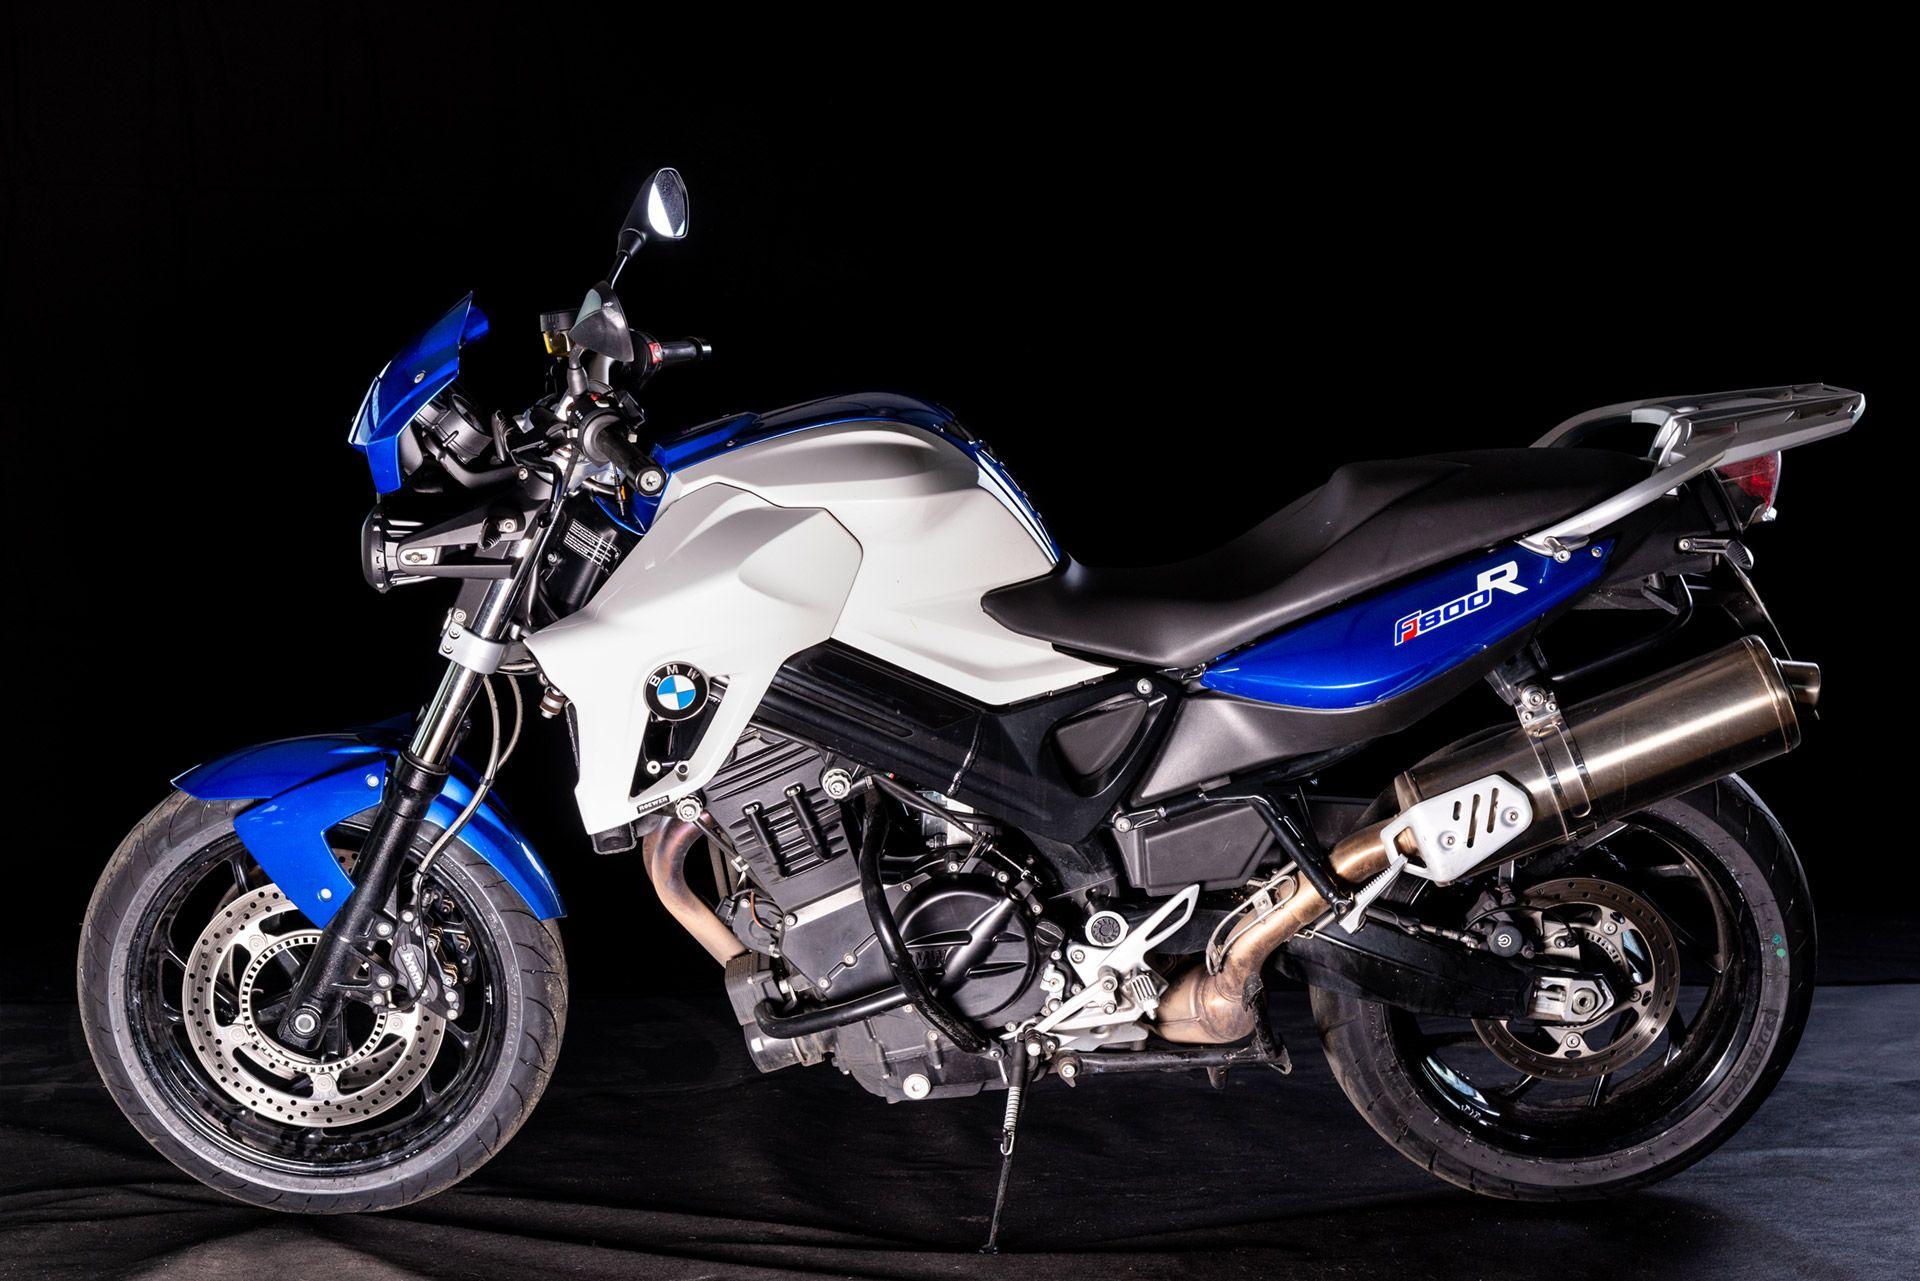 Fahrschule Berlin allroad Motorrad BMW F800R Seitenansicht